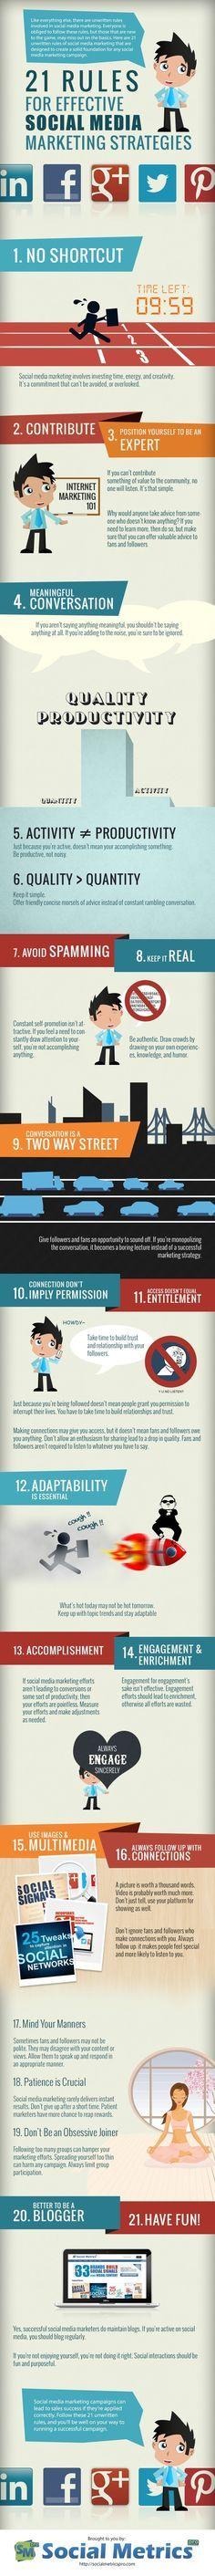 Social Media Marketing Strategies #Infographic #socialmedia #marketing http://bitrebels.com?utm_content=buffer37a9a&utm_medium=social&utm_source=pinterest.com&utm_campaign=buffer http://arcreactions.com/services/graphic-design/?utm_content=buffere6b5a&utm_medium=social&utm_source=pinterest.com&utm_campaign=buffer